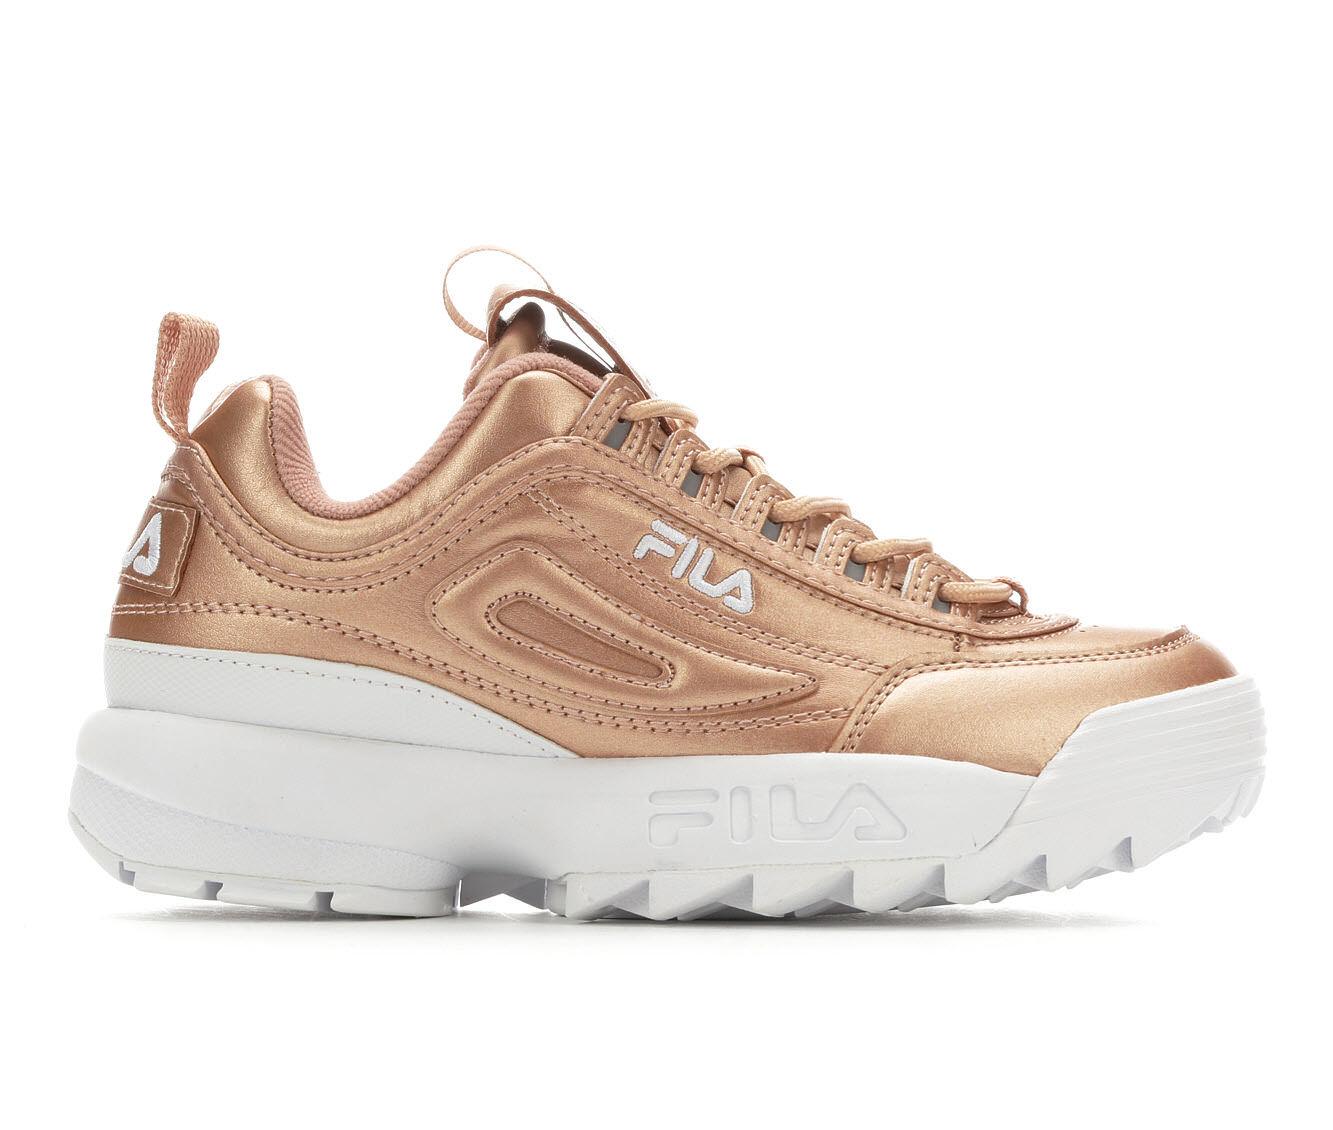 Women's Fila Disruptor II Premium Metallic Sneakers Rose/Gold/Wht